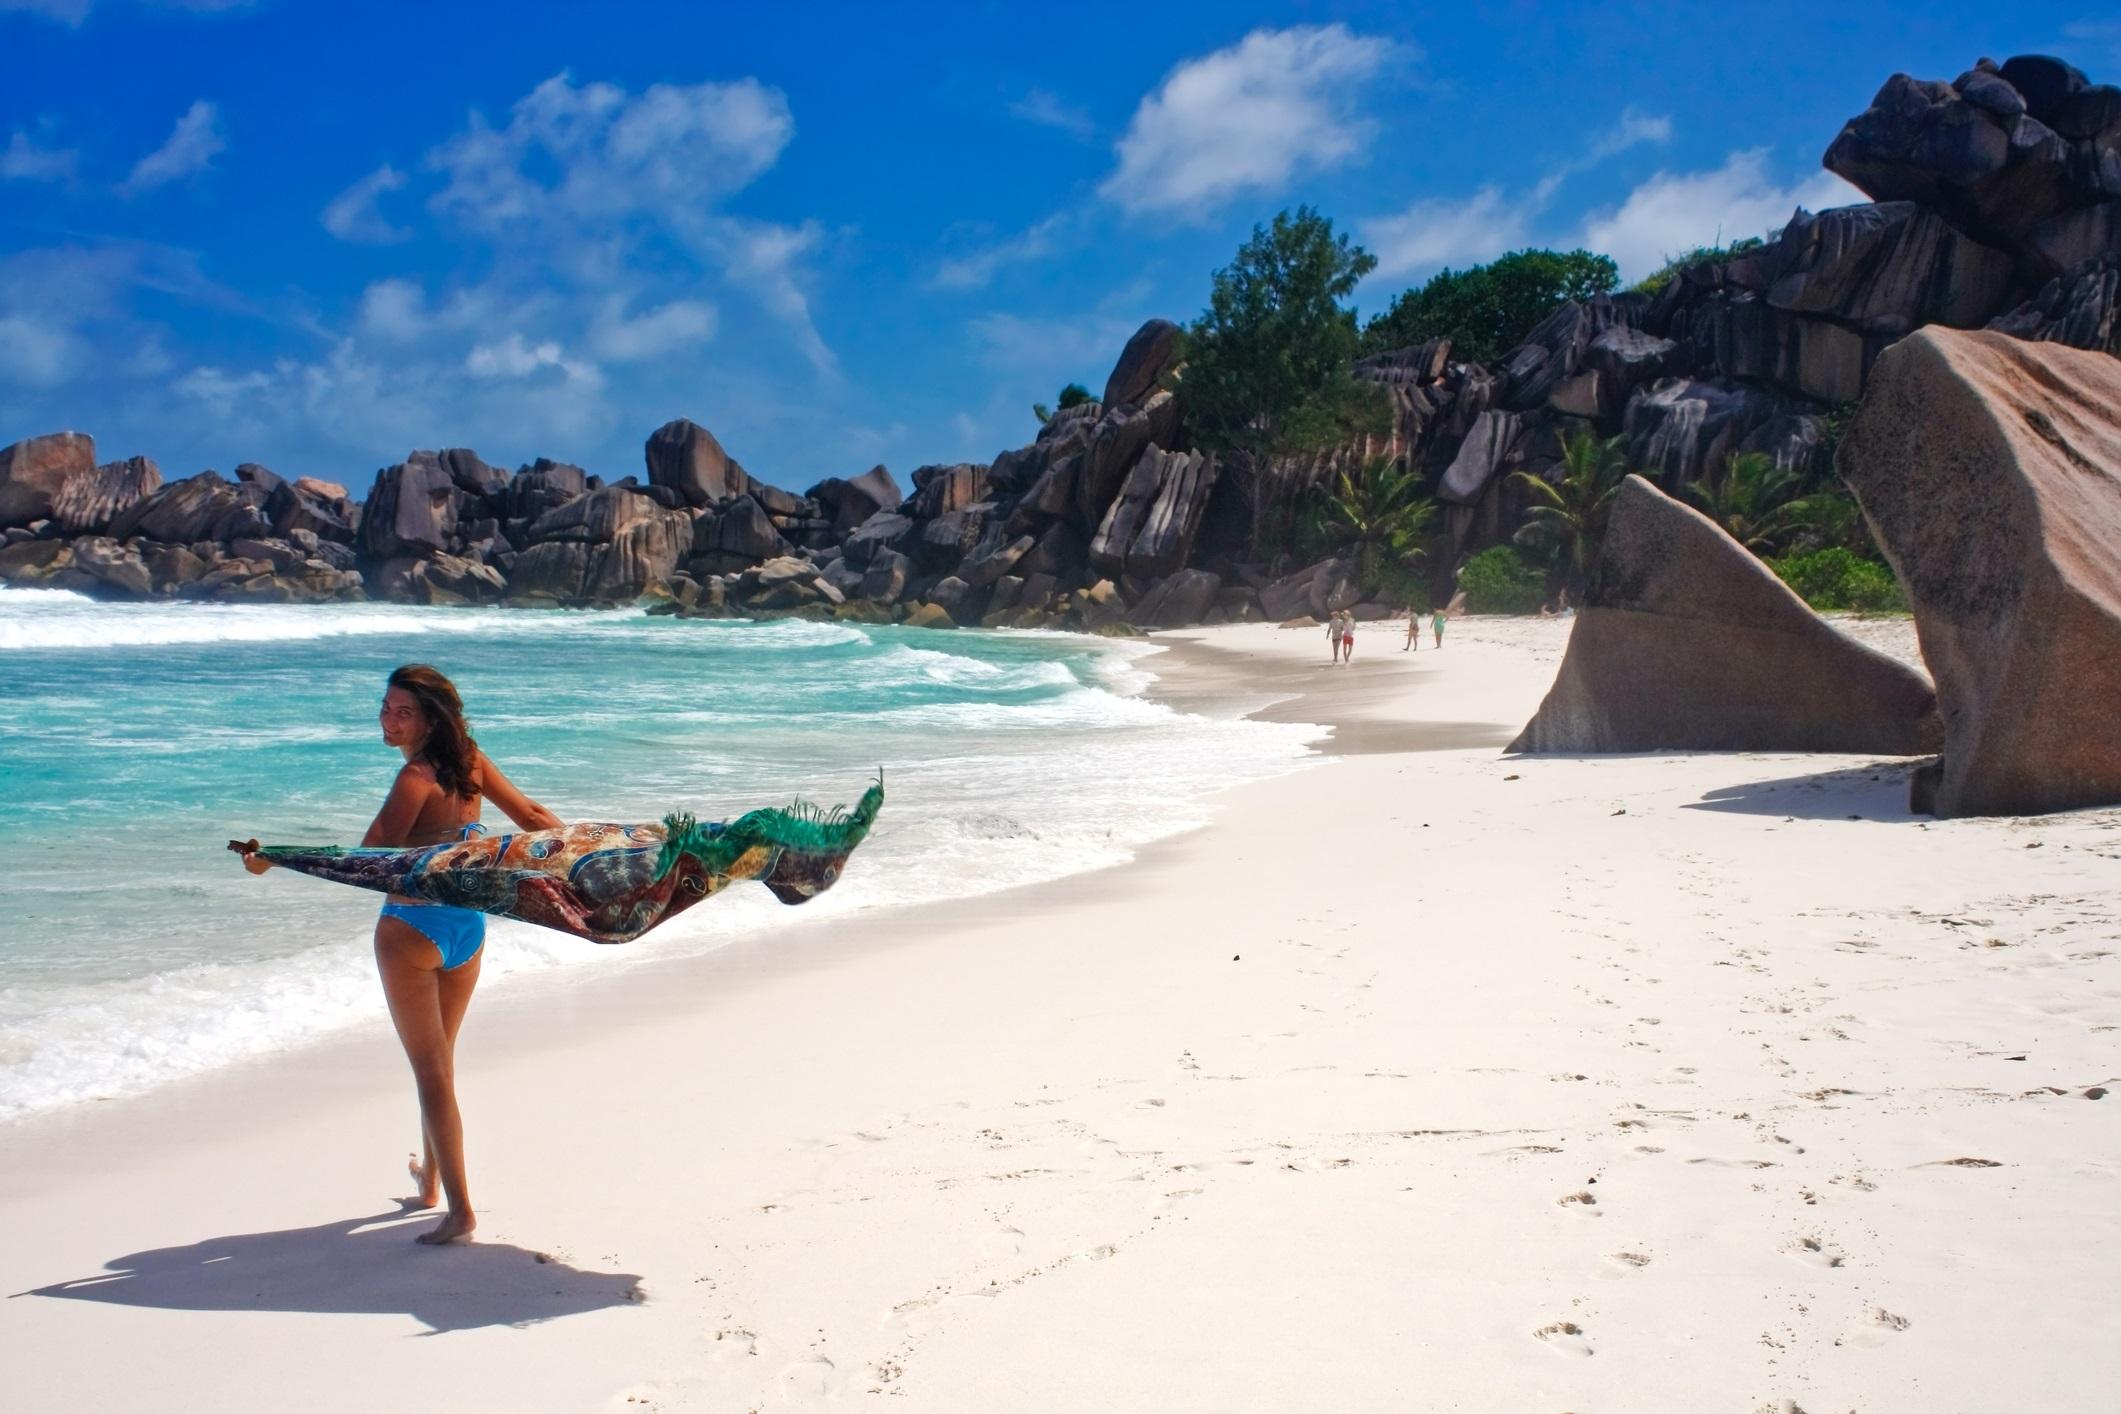 Young woman walking on tropical beach called Grande Anse, La Digue Island, Seychelles, Indian Ocean.